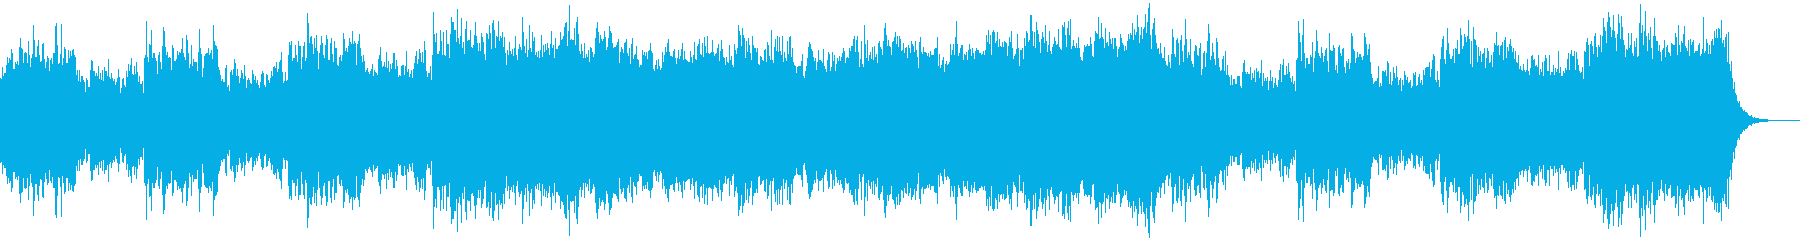 【YouTube】どうなる!?緊迫した曲の再生済みの波形